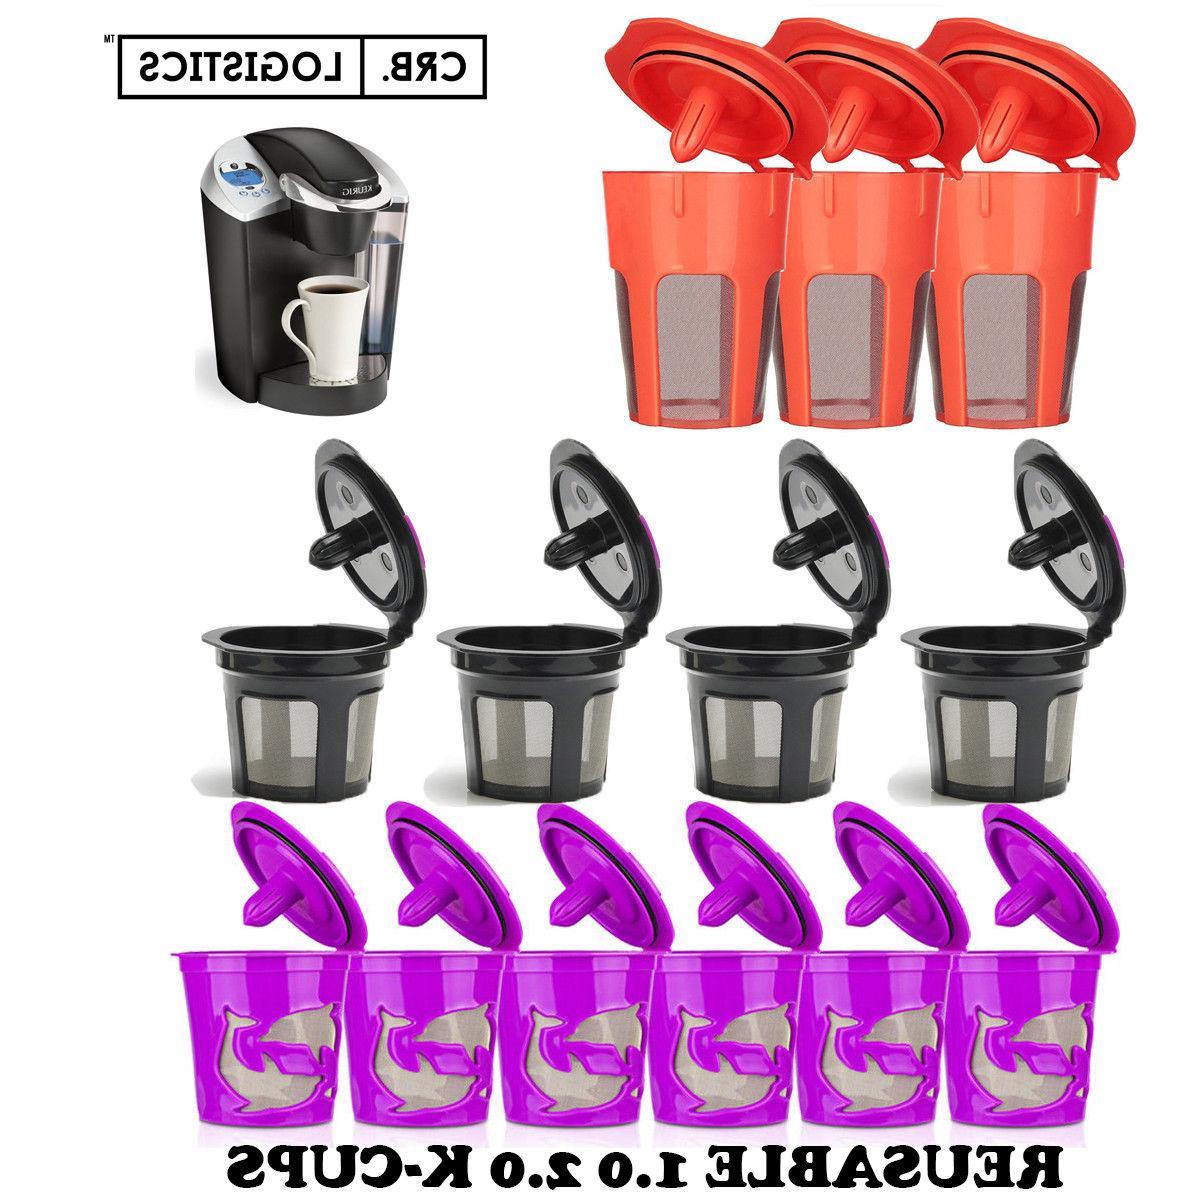 refillable reusable k cup k carafe coffee